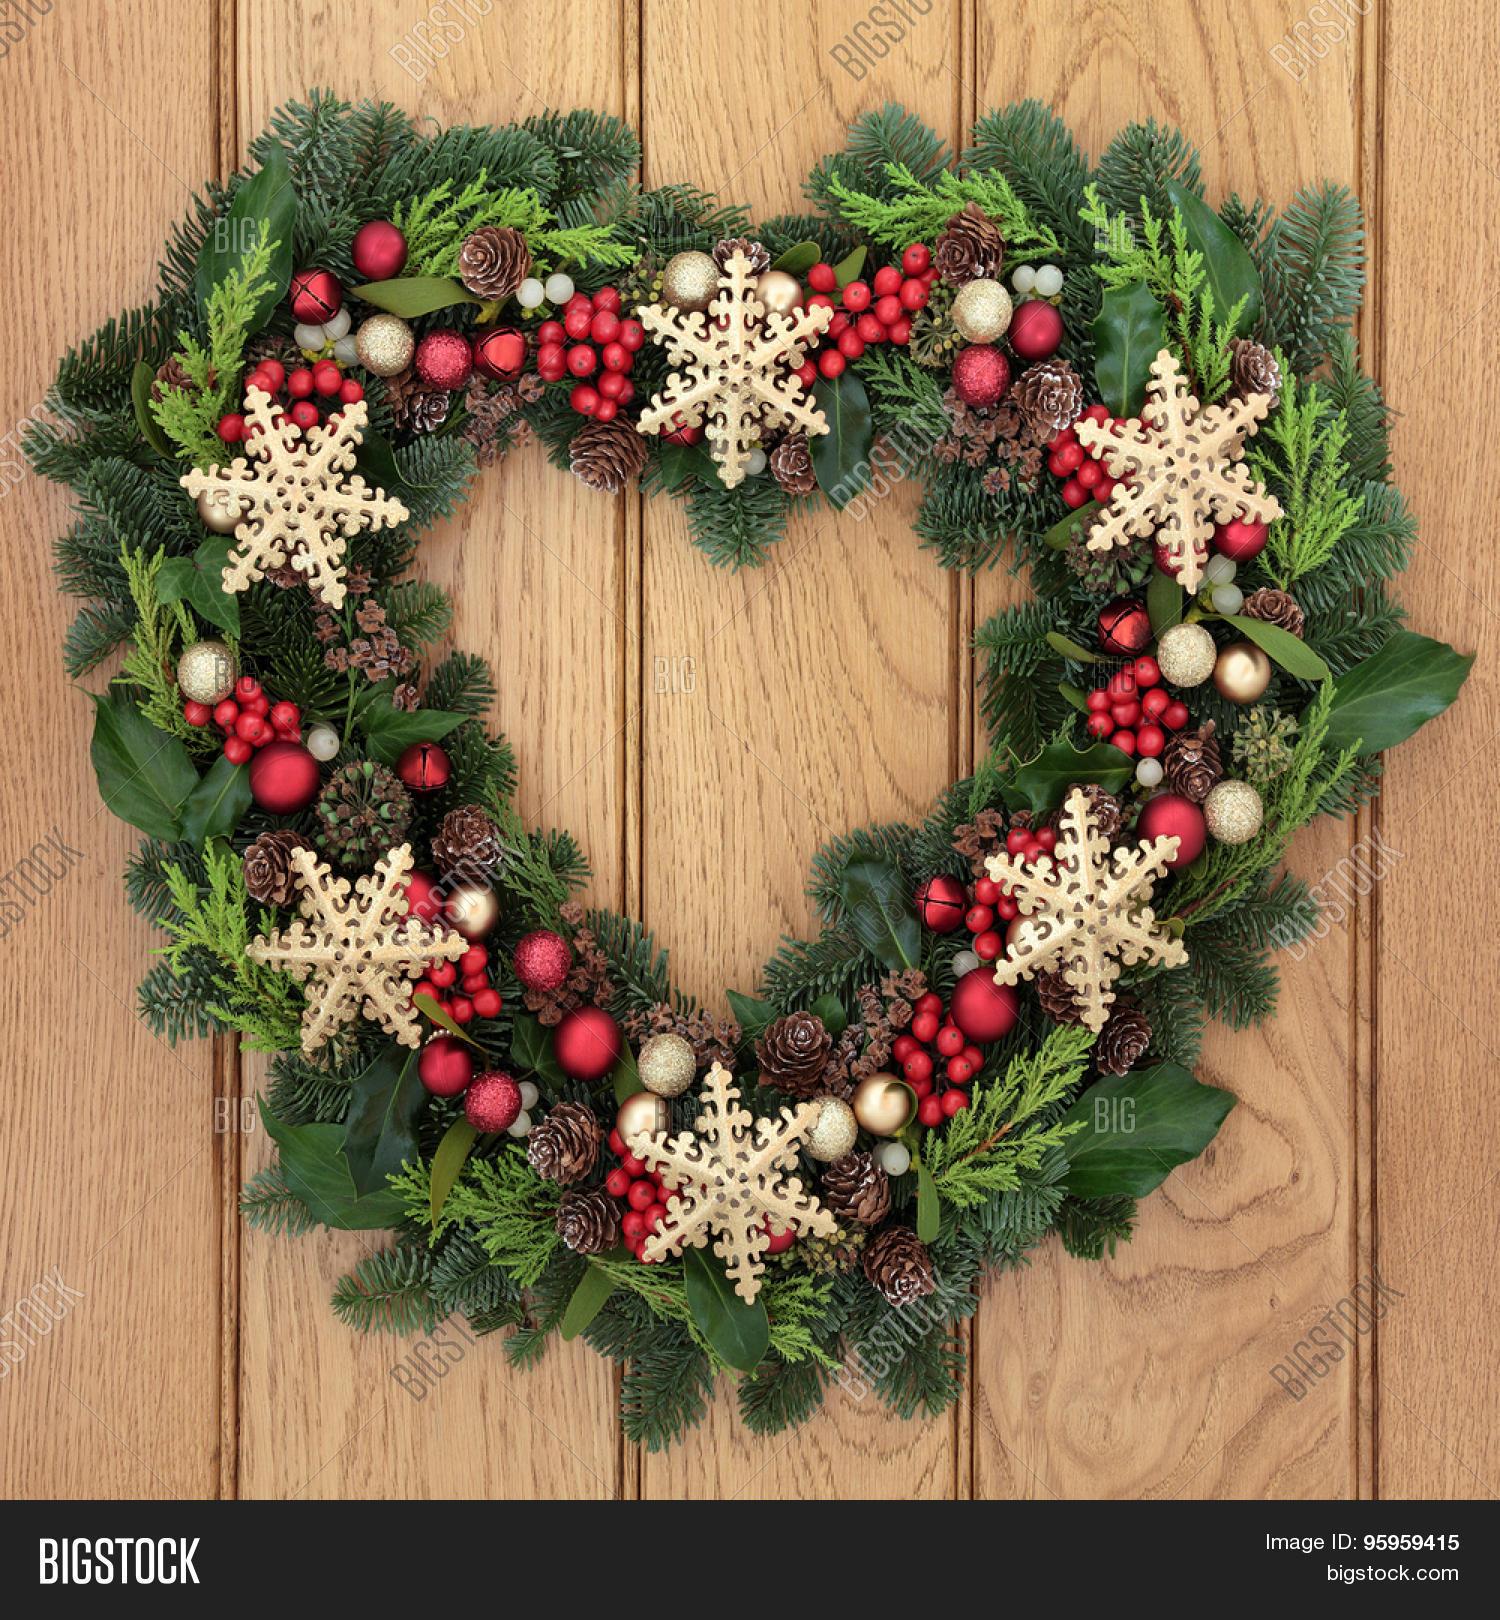 Christmas heart shaped wreath gold image photo bigstock christmas heart shaped wreath with gold snowflake bauble decorations holly mistletoe and winter greenery rubansaba